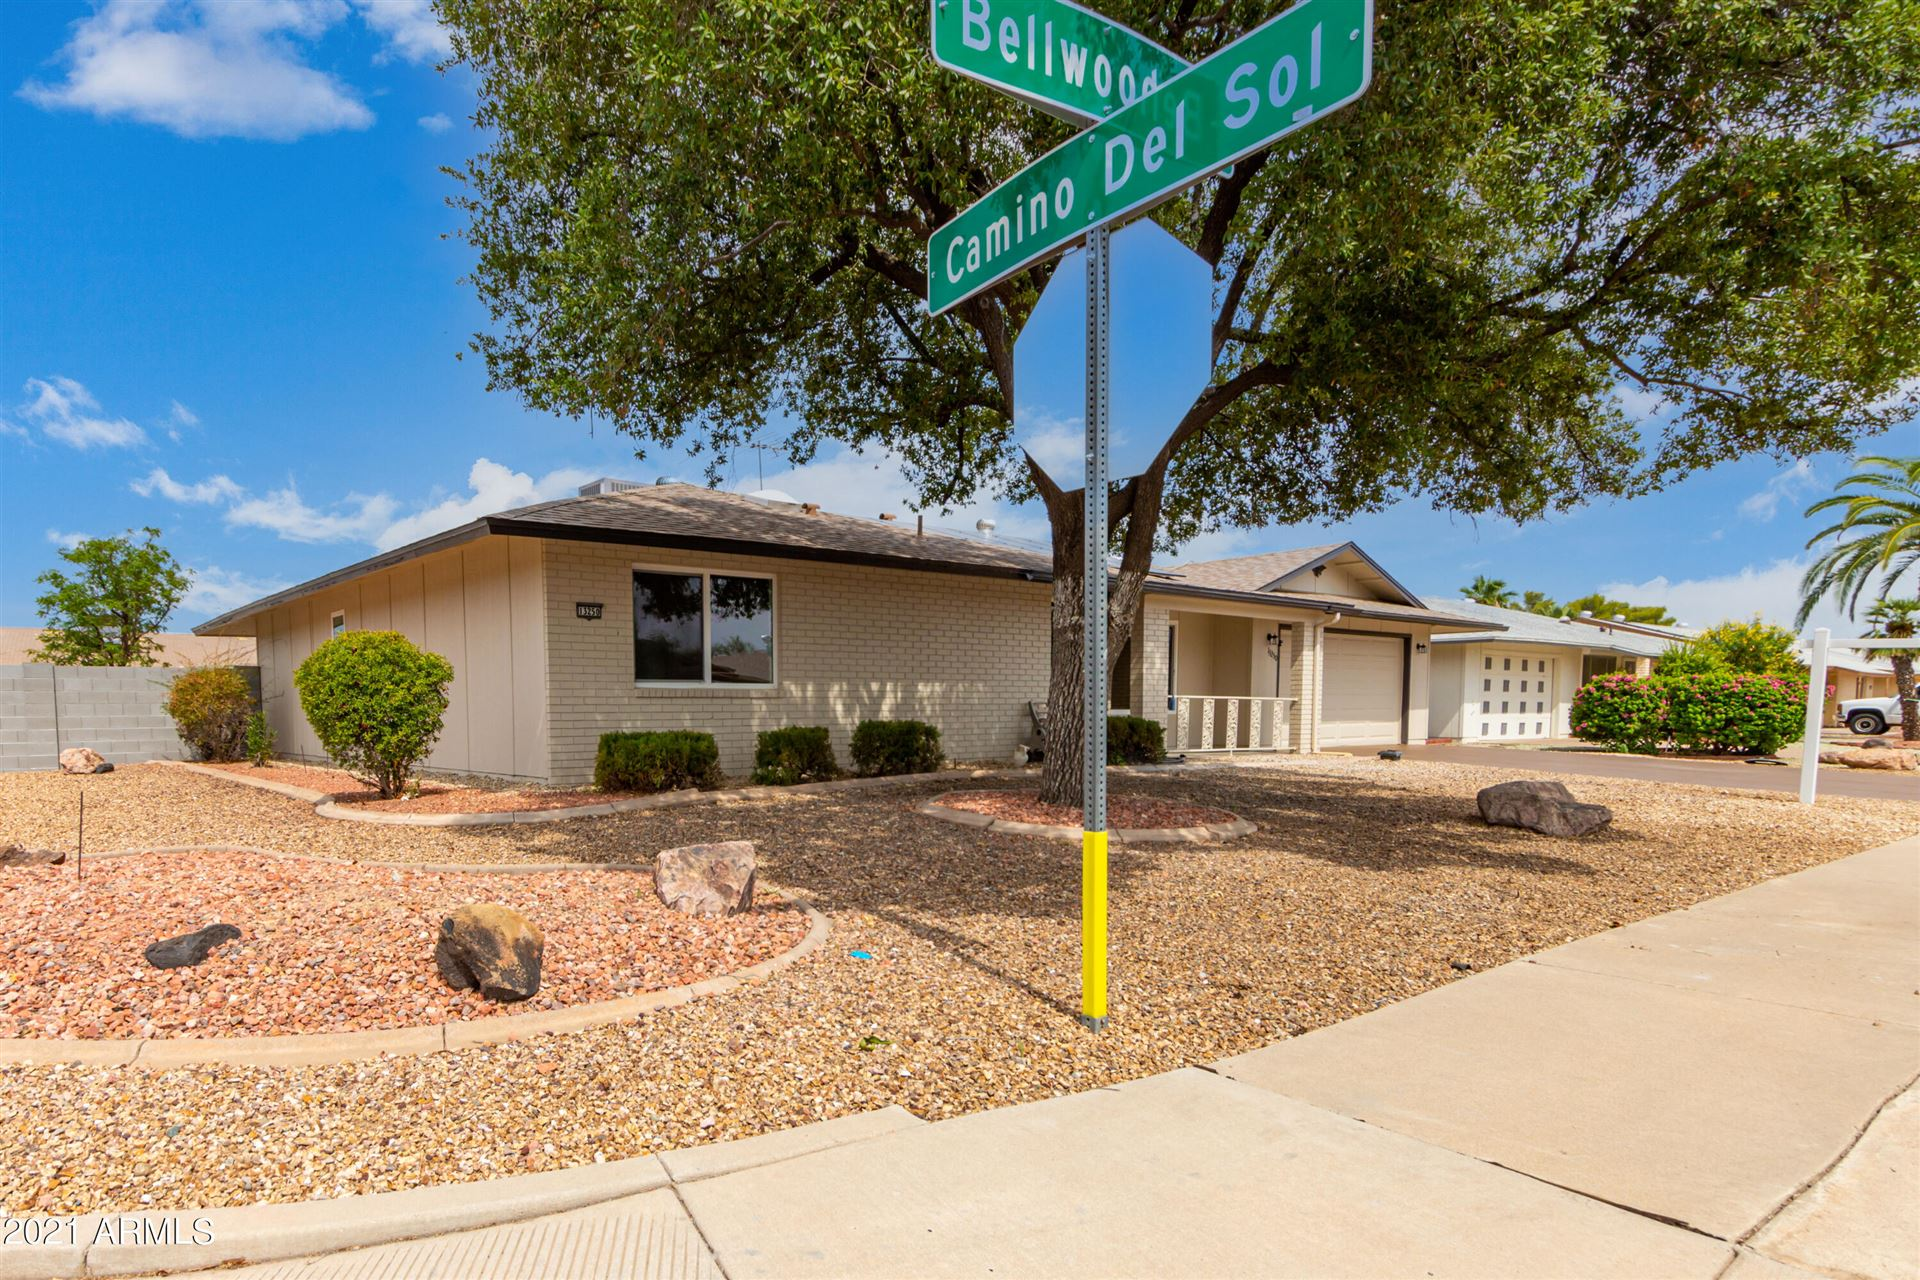 Photo of 13250 W BELLWOOD Drive, Sun City West, AZ 85375 (MLS # 6268167)